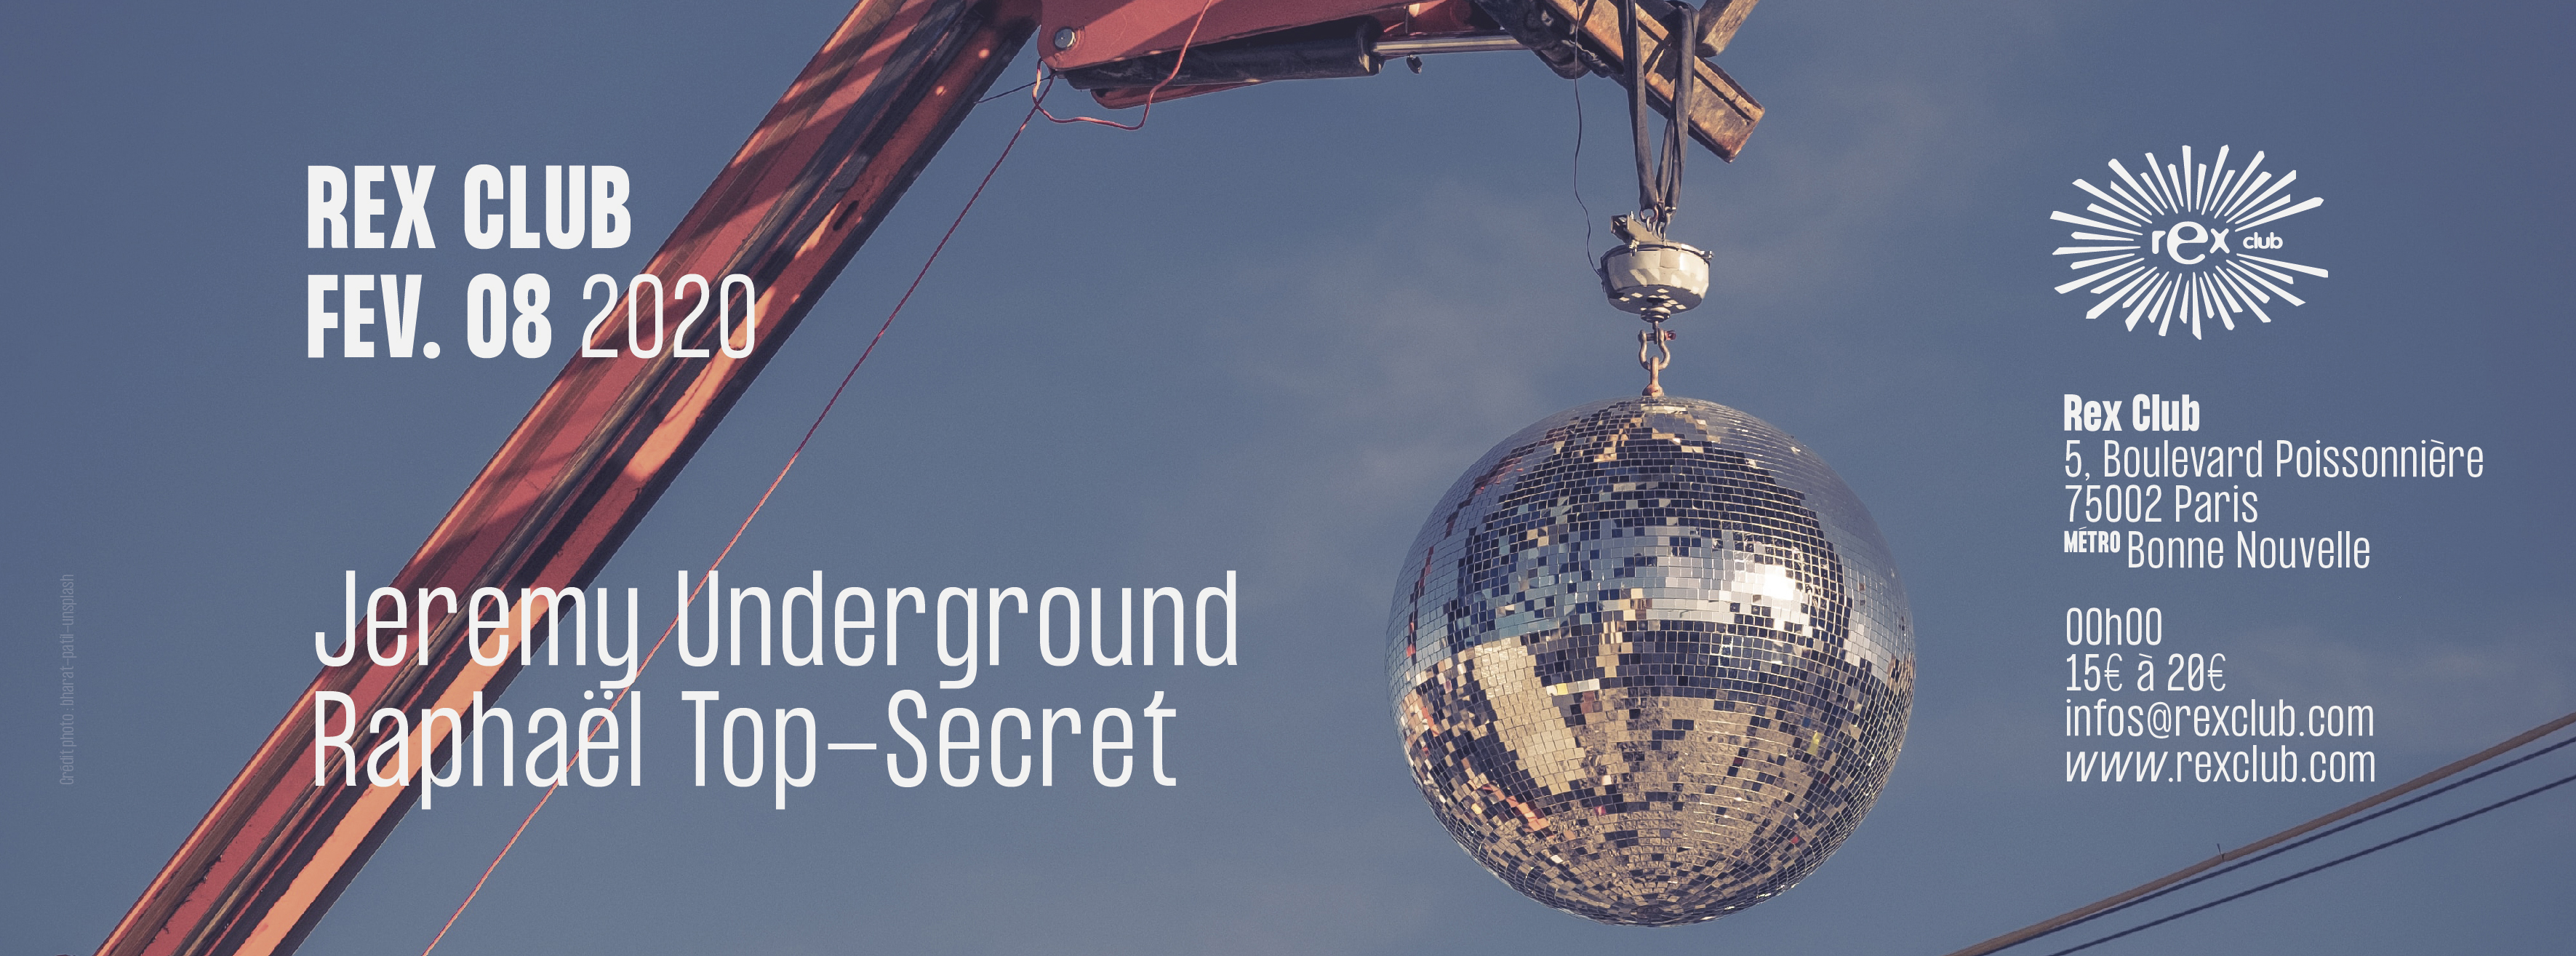 Rex Club Présente: Jeremy Underground & Raphaël Top-Secret